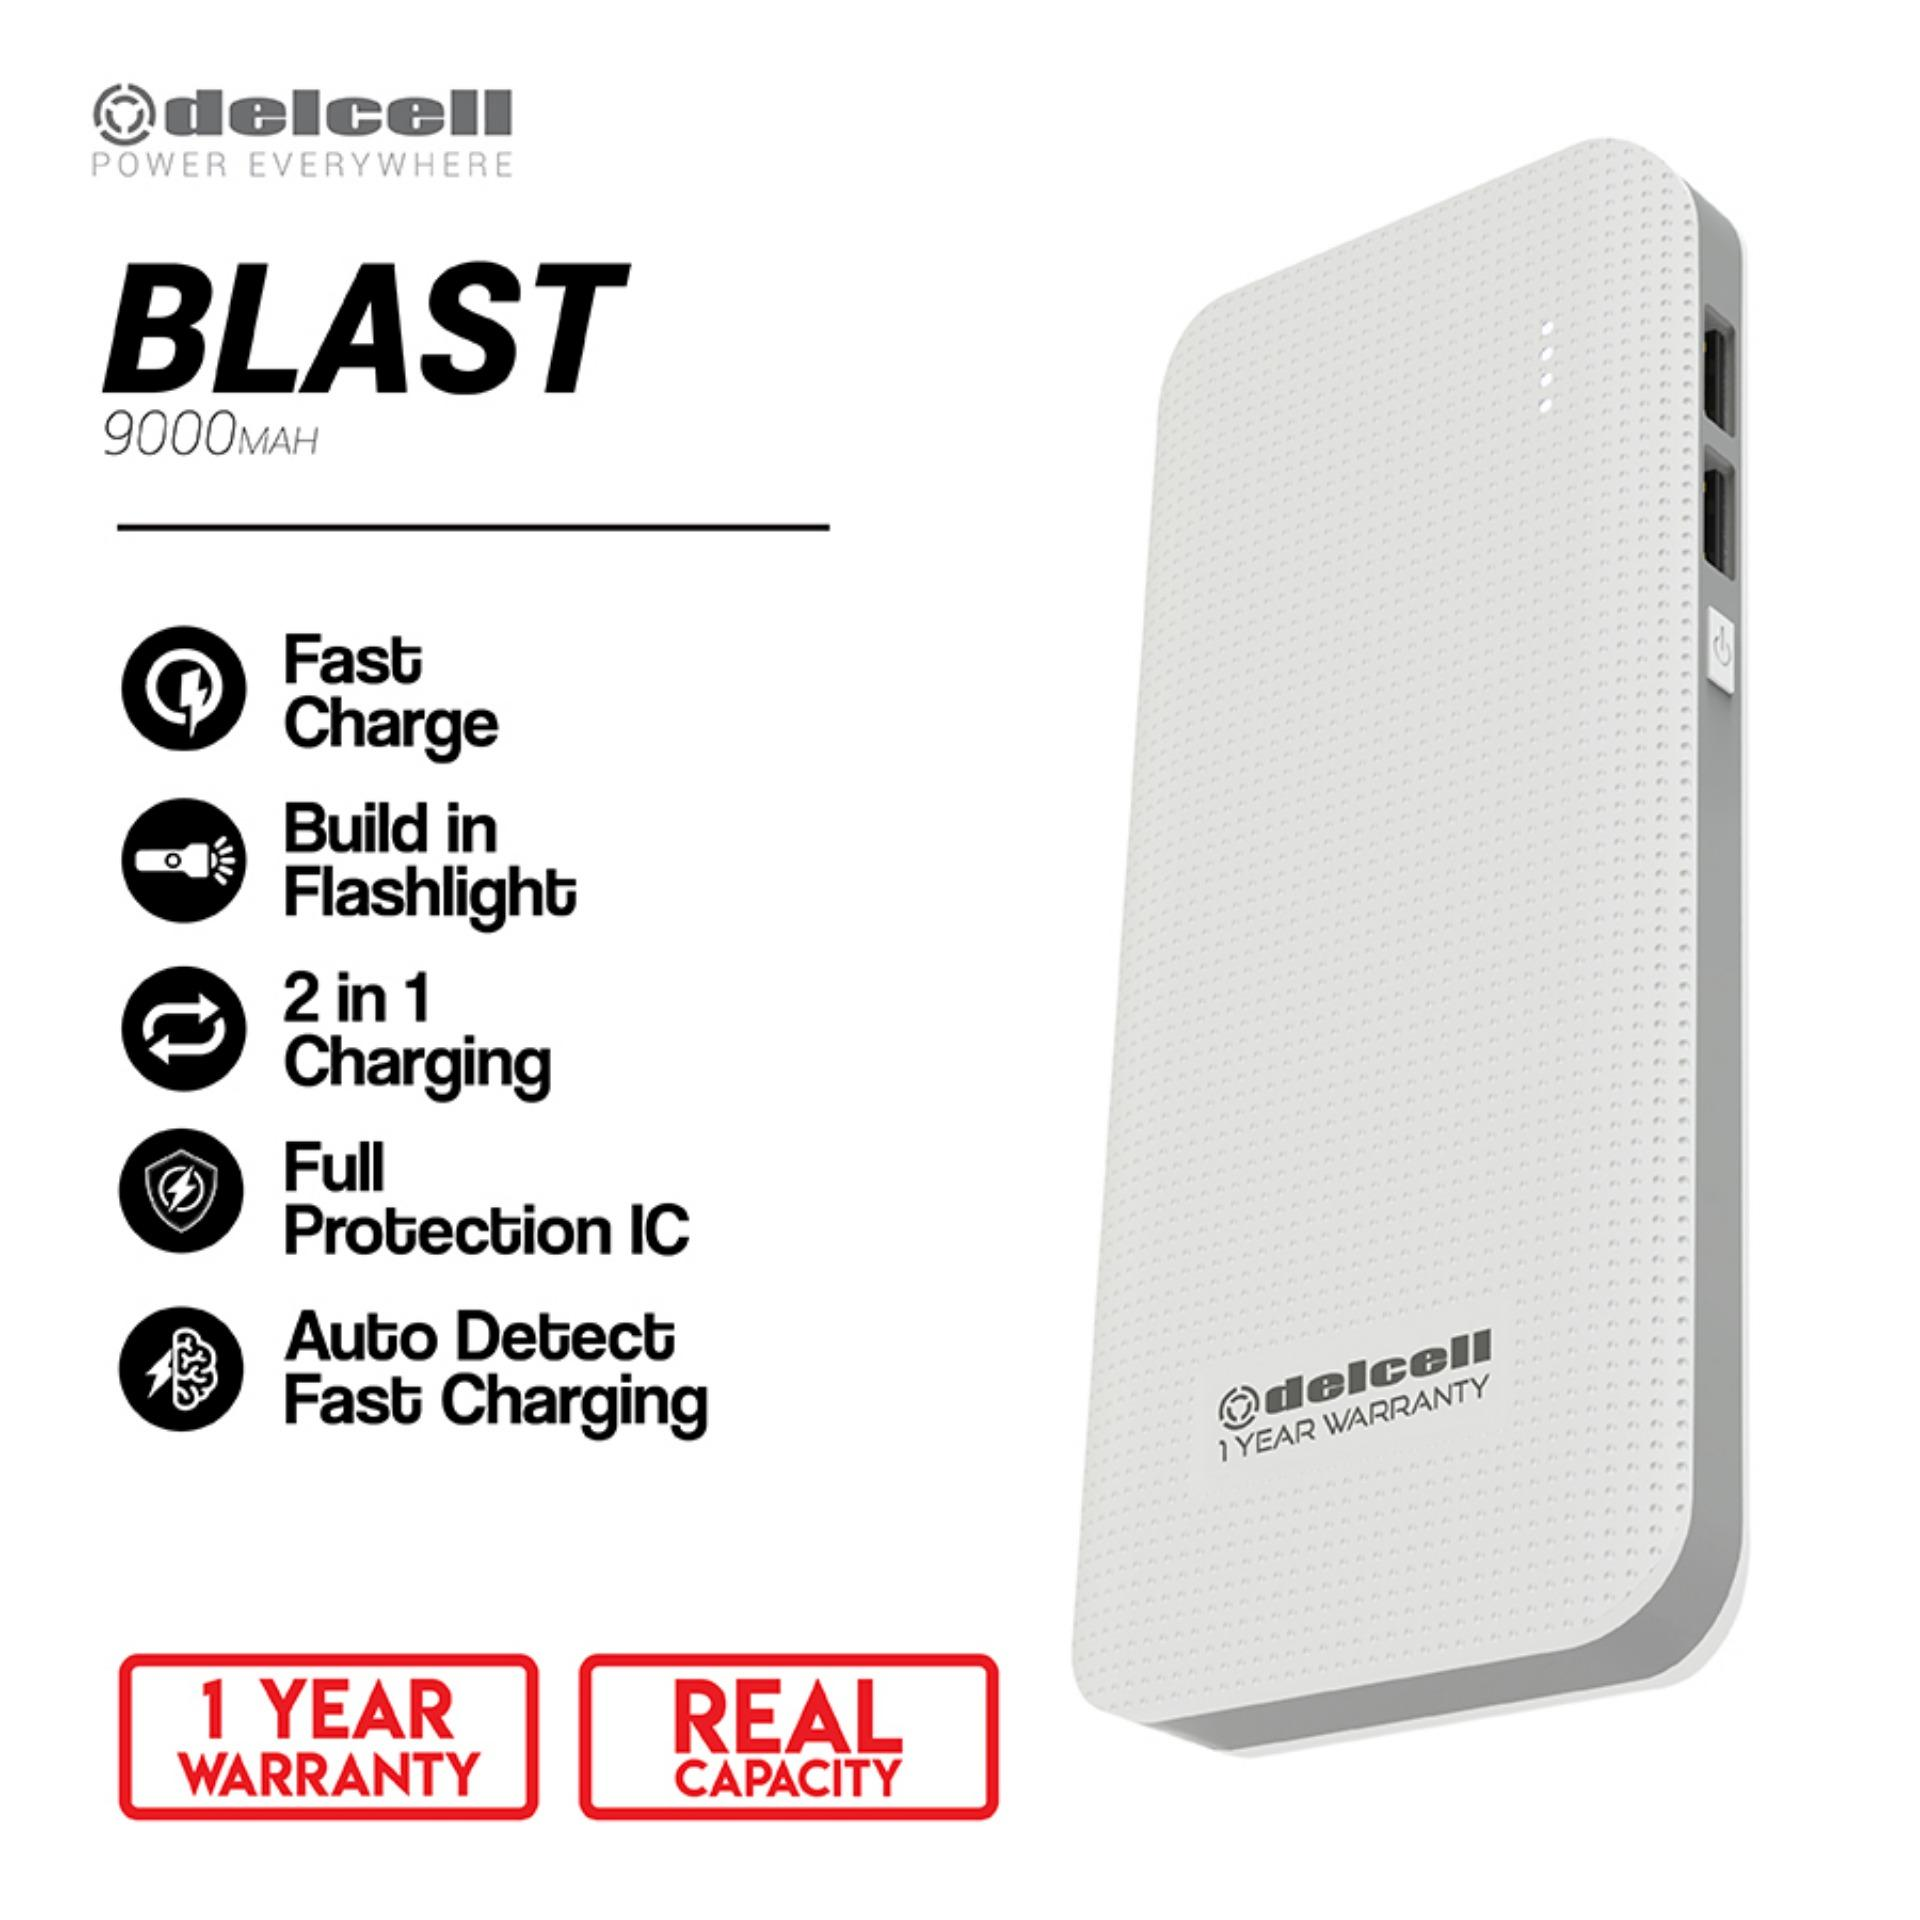 Promo Samsung September Calandiva Premium Front Back Galaxy A6 2018 56 Inch Tg Biru Delcell 9000mah Powerbank Blast Real Capacity Fast Charging Dual Output Garansi Resmi 1 Tahun Power Bank